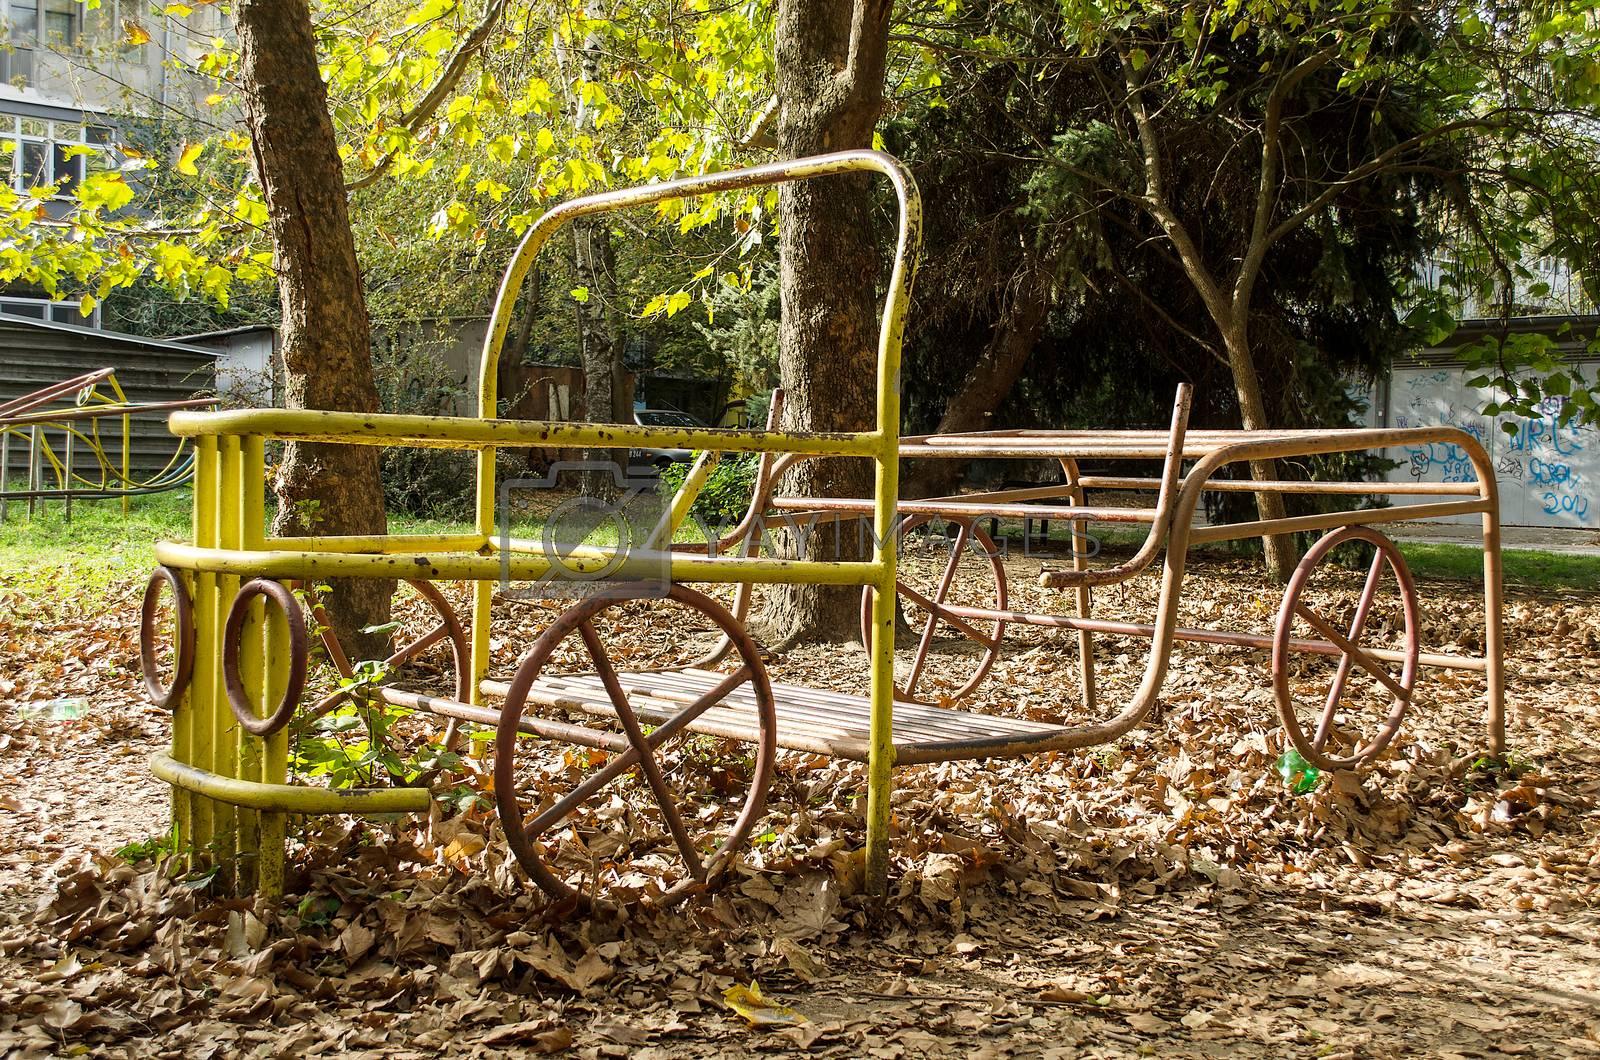 Playground  yellow truck retro spring close up